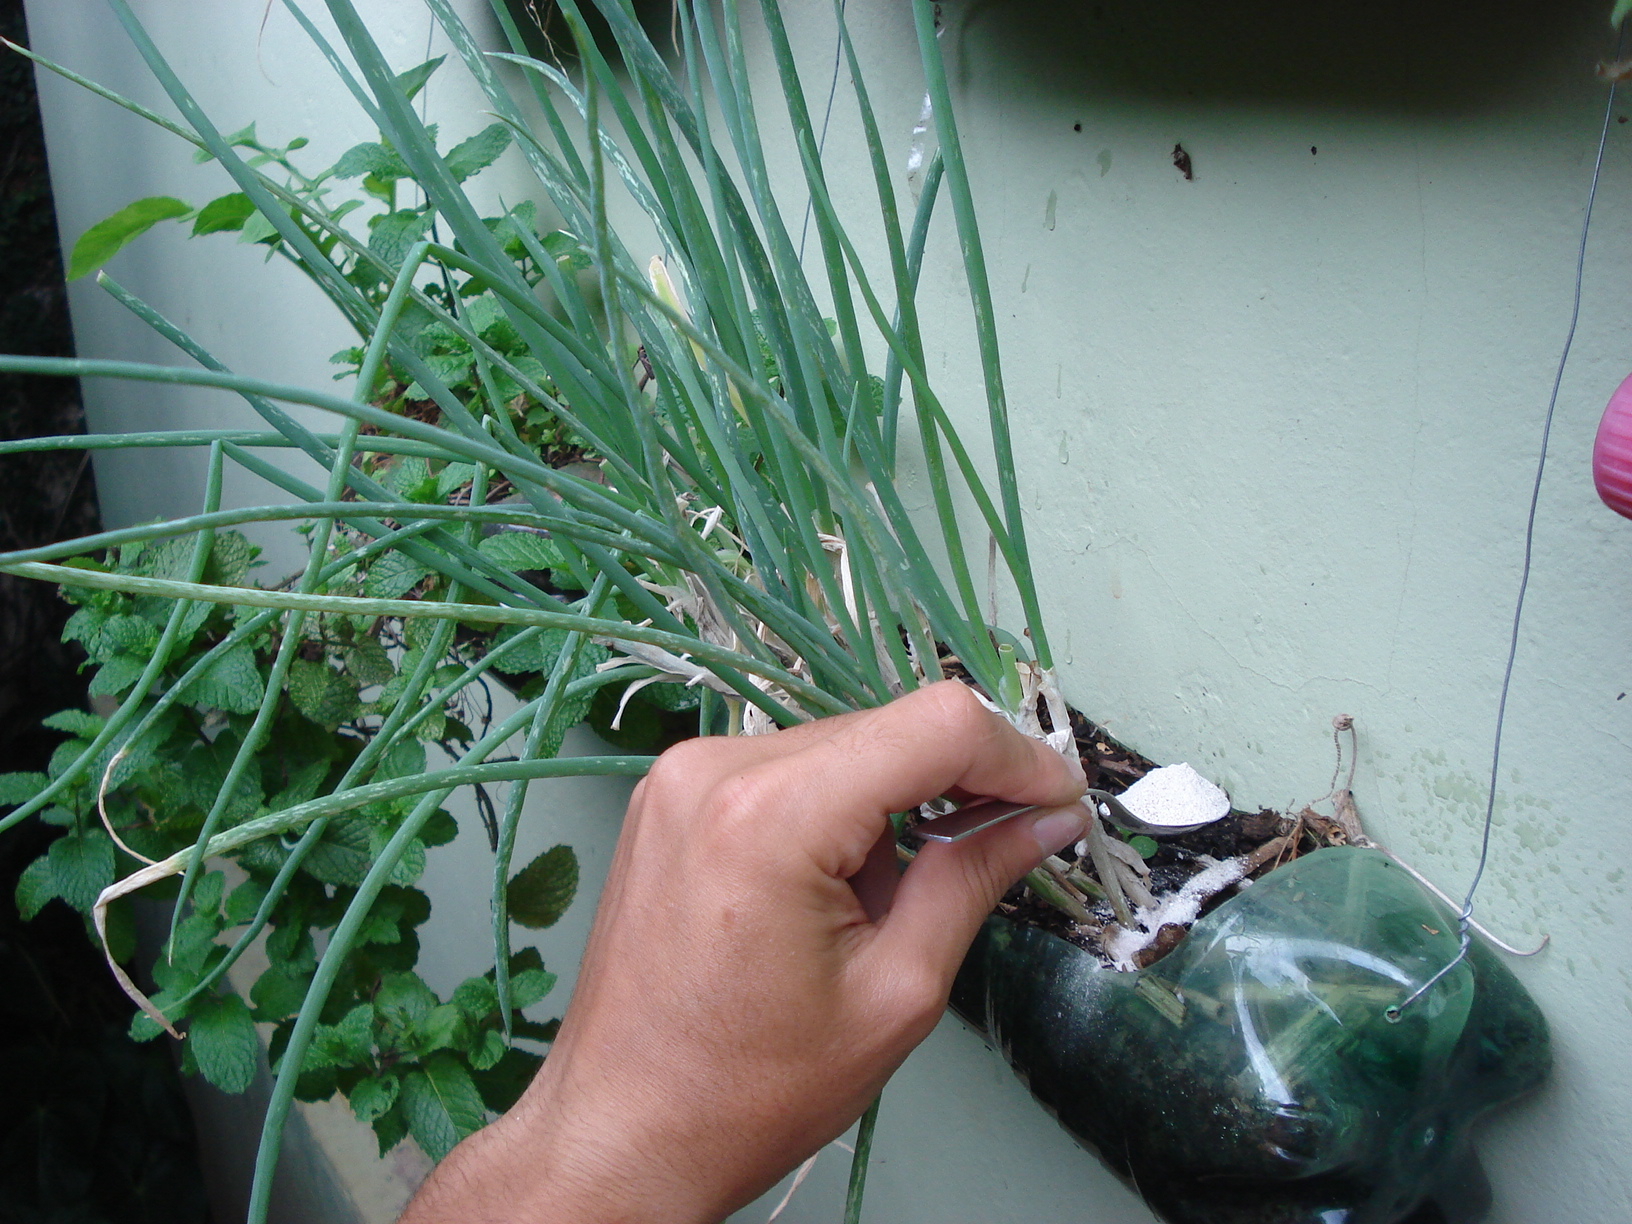 A farinha de ovo pode ser utilizada como adubo natural (fonte de cálcio) e como corretivo agrícola.